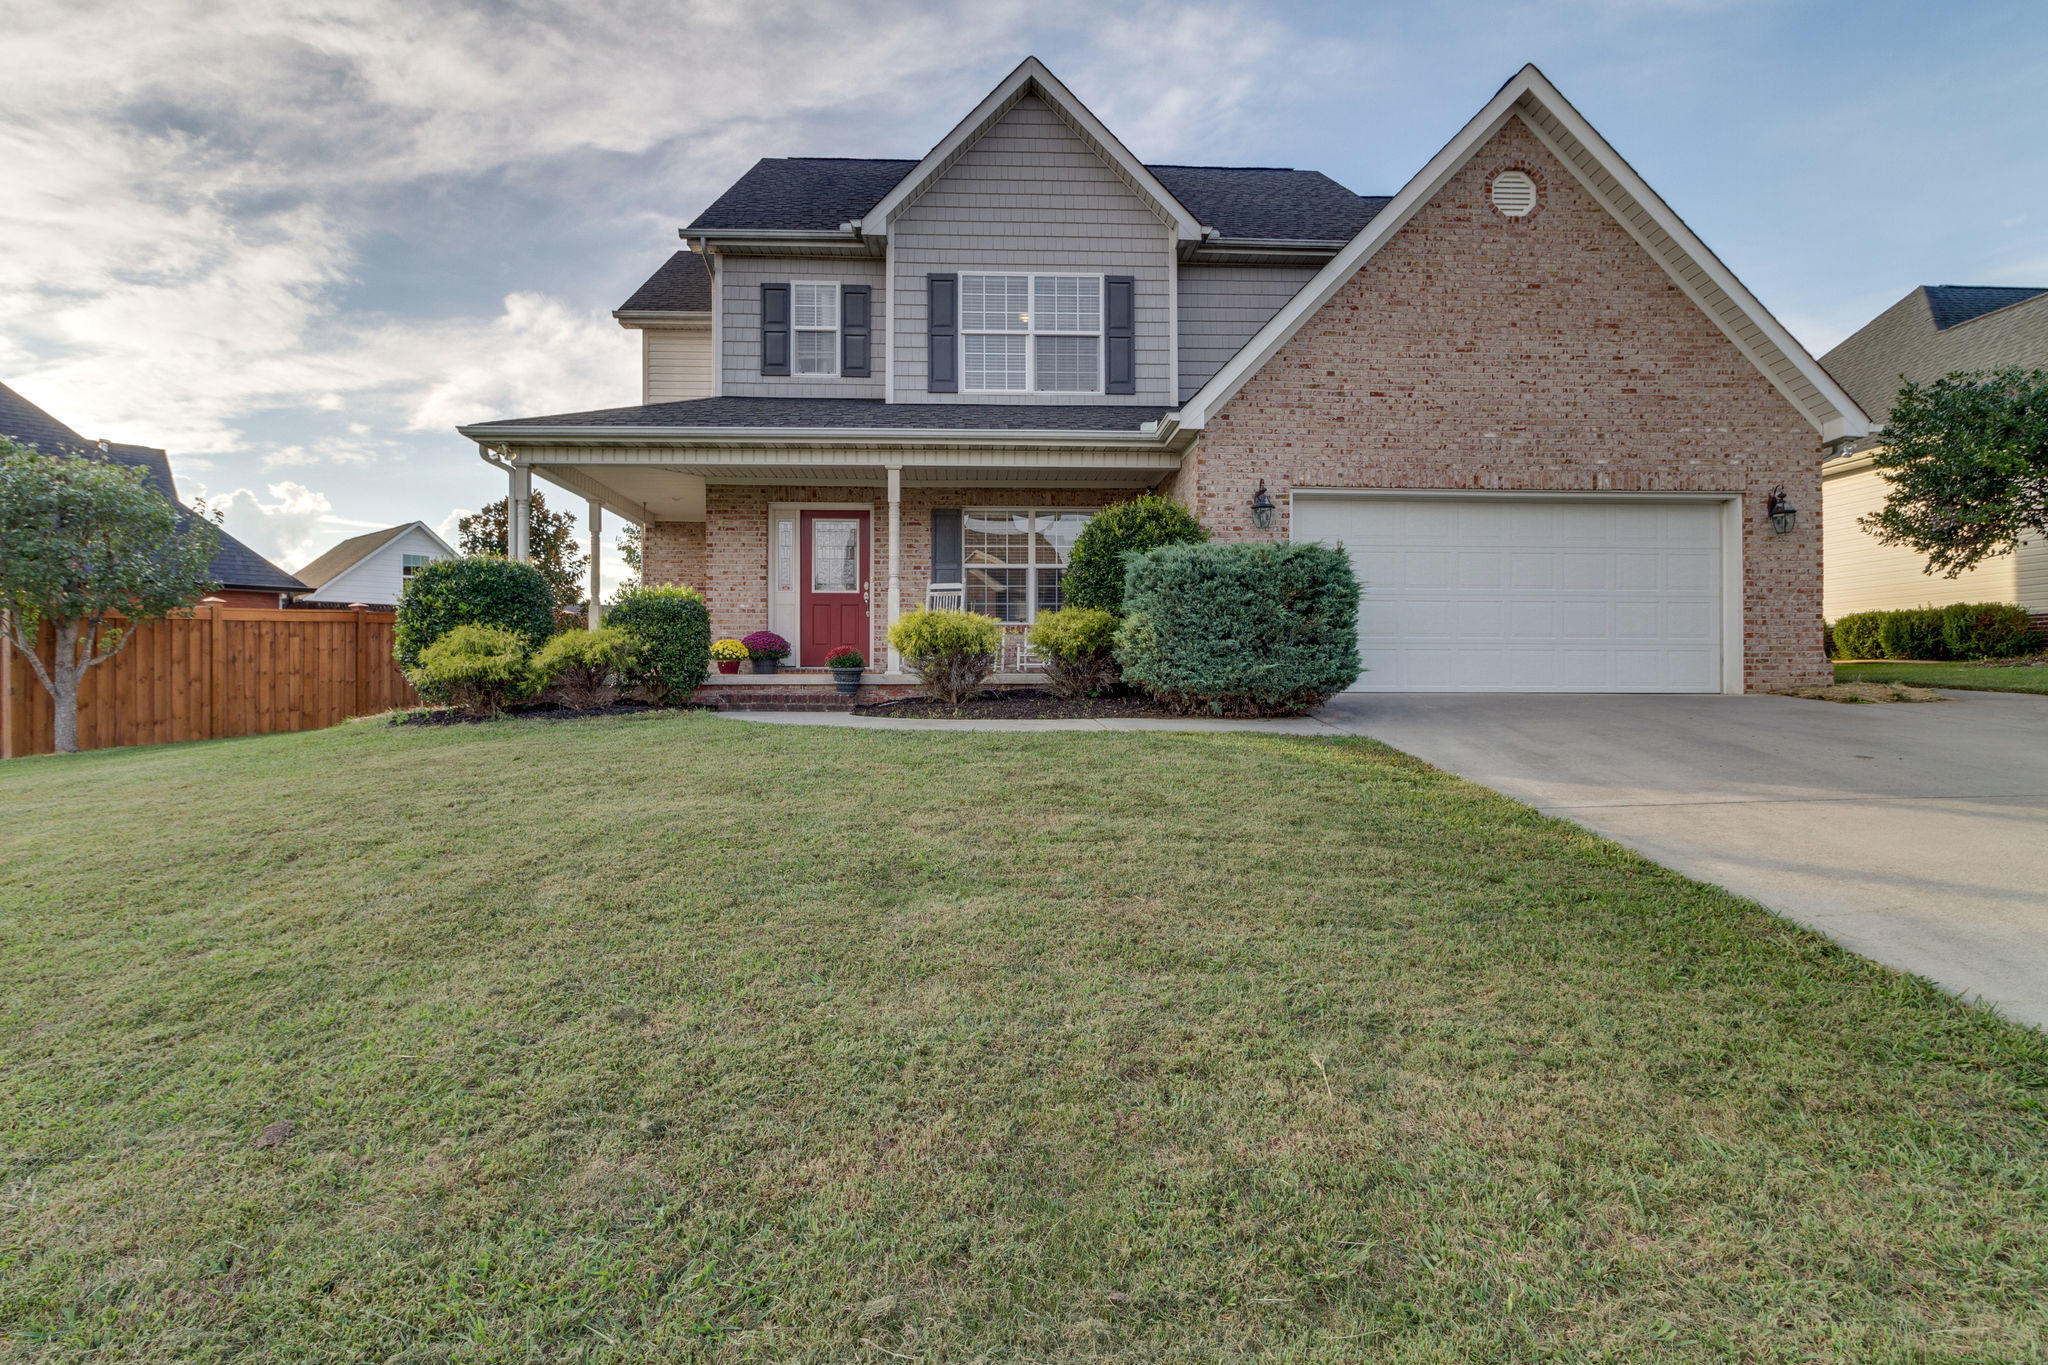 7613 Vista View Lane, Knoxville, TN 37924